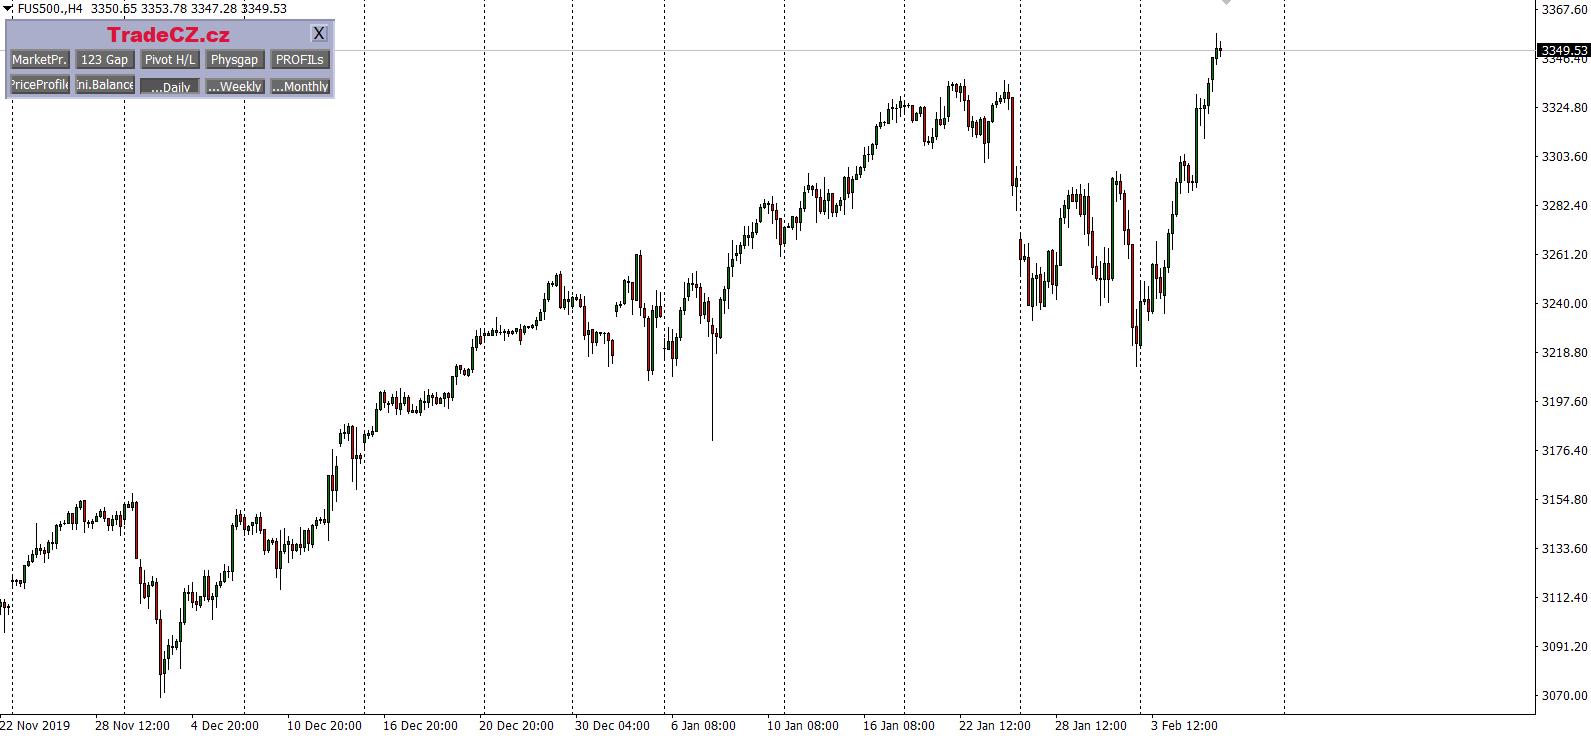 Index SP500 price action